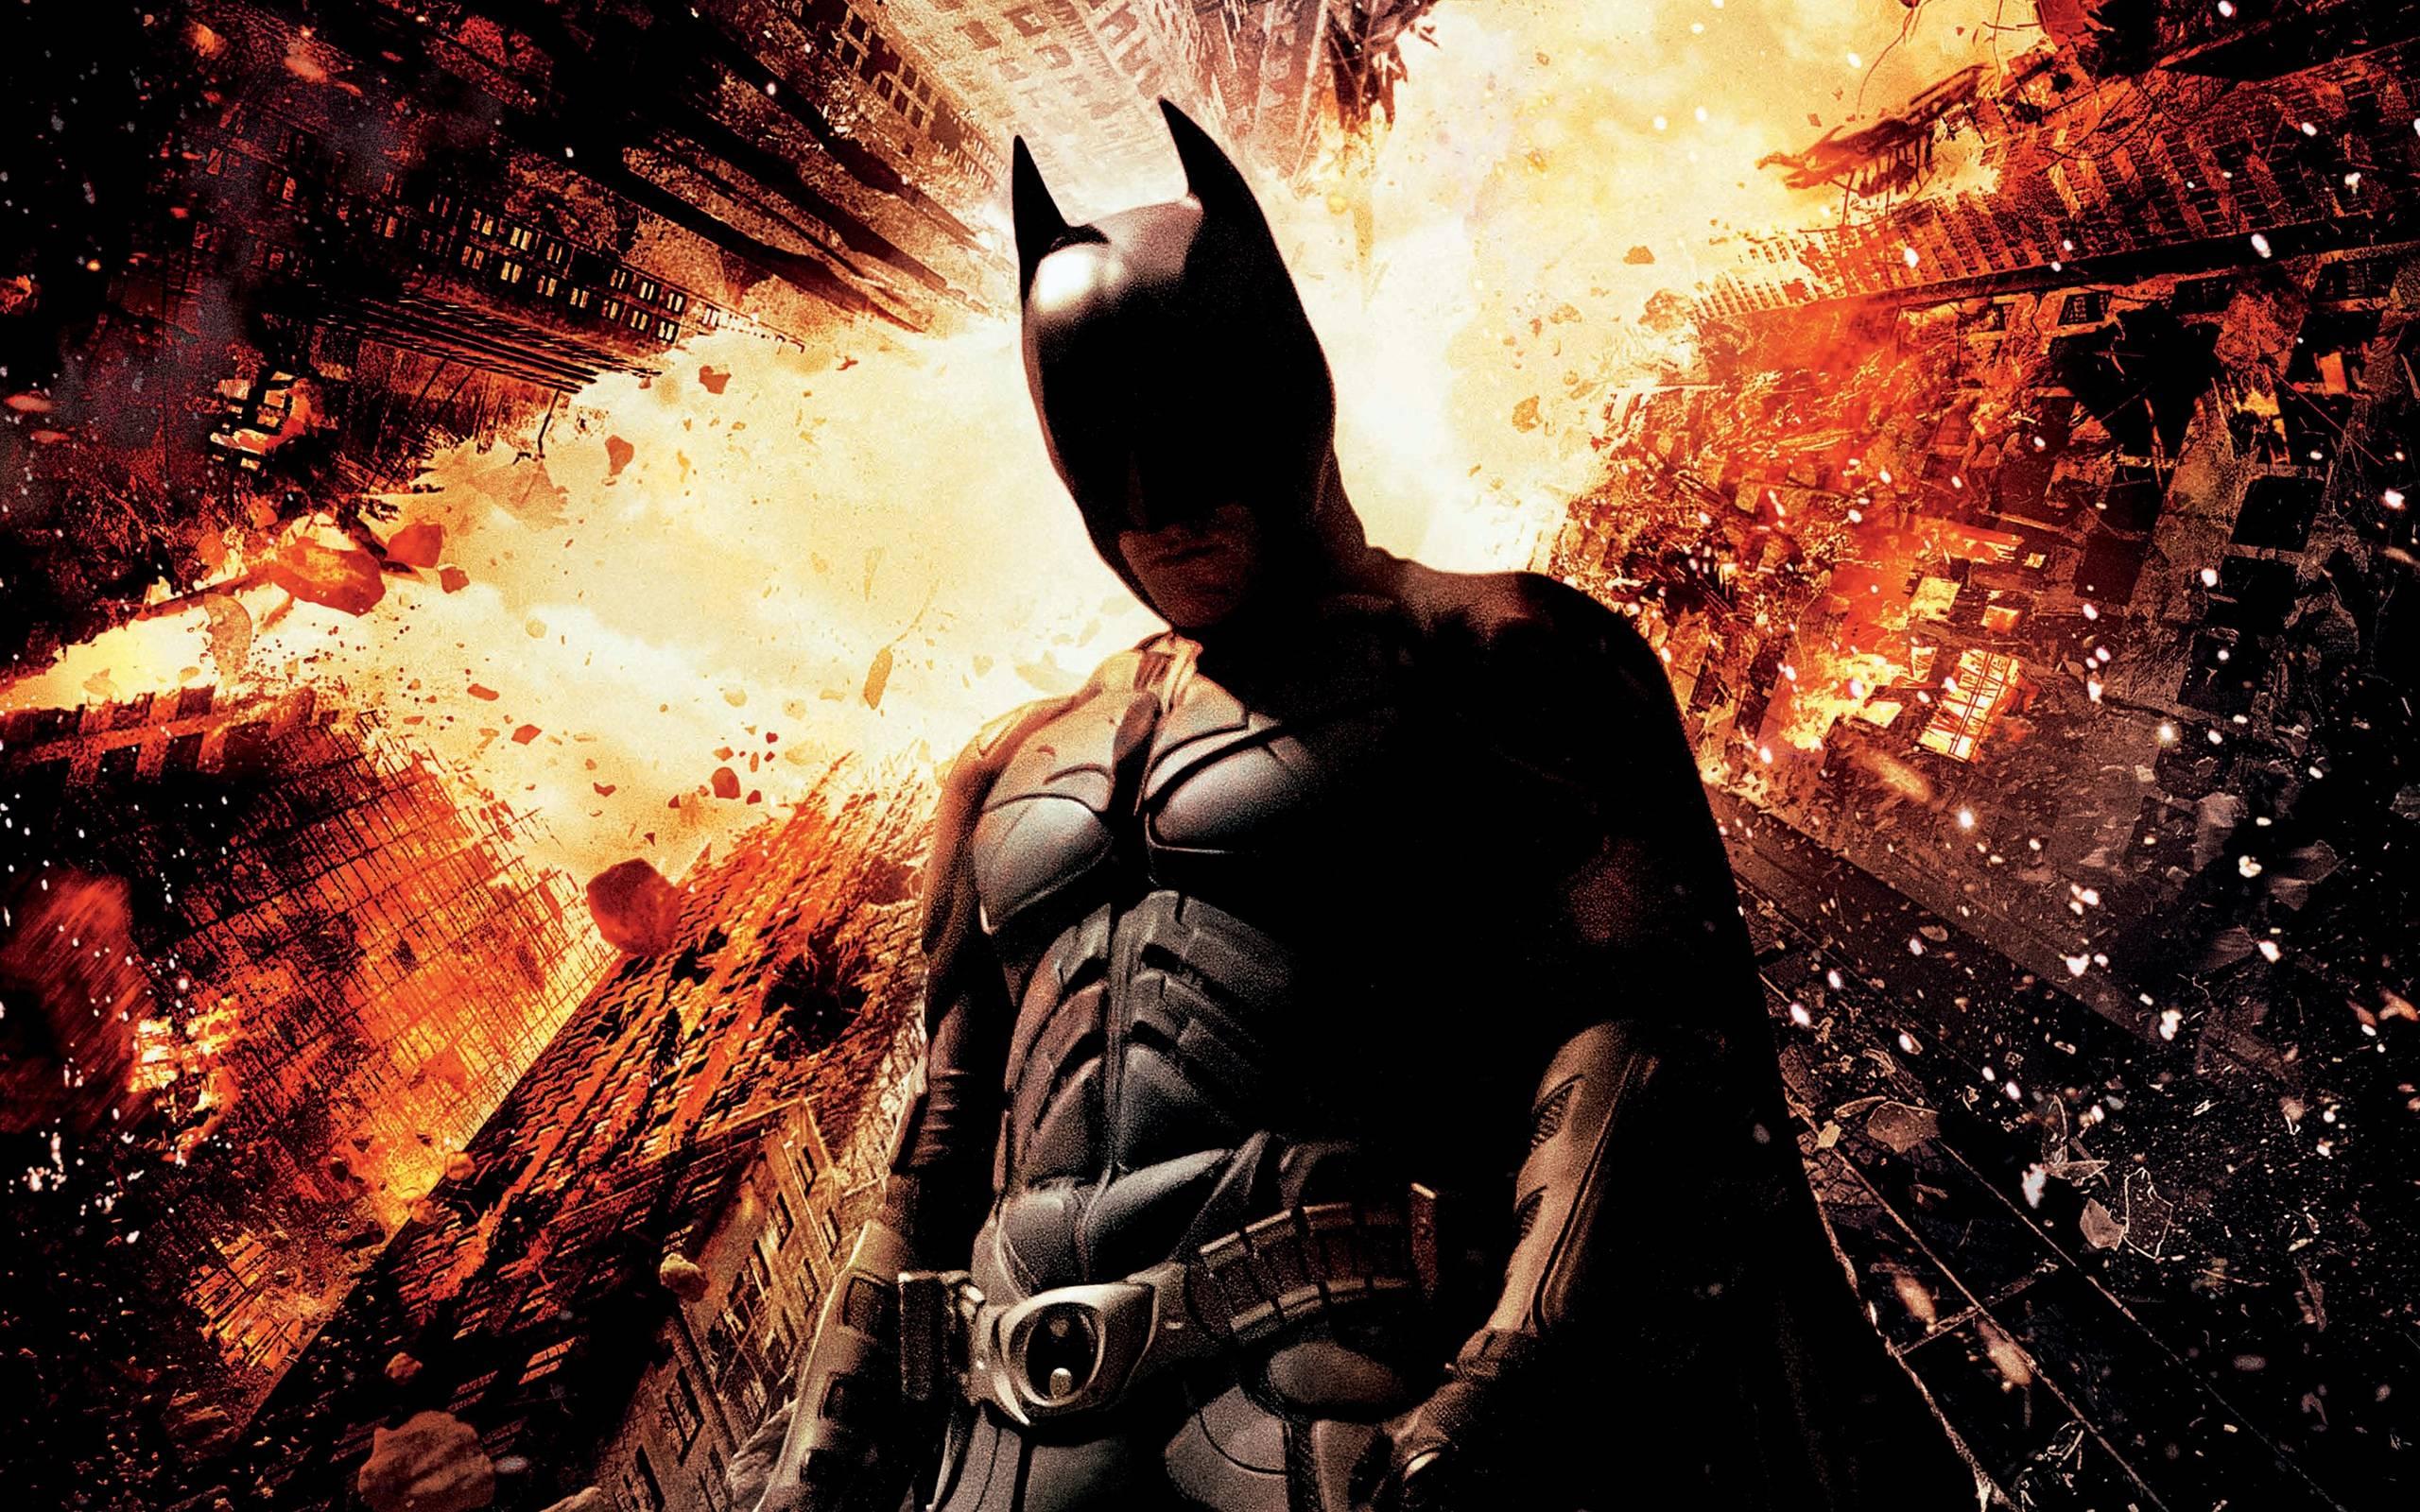 Dark Knight HD Wallpapers - Wallpaper Cave